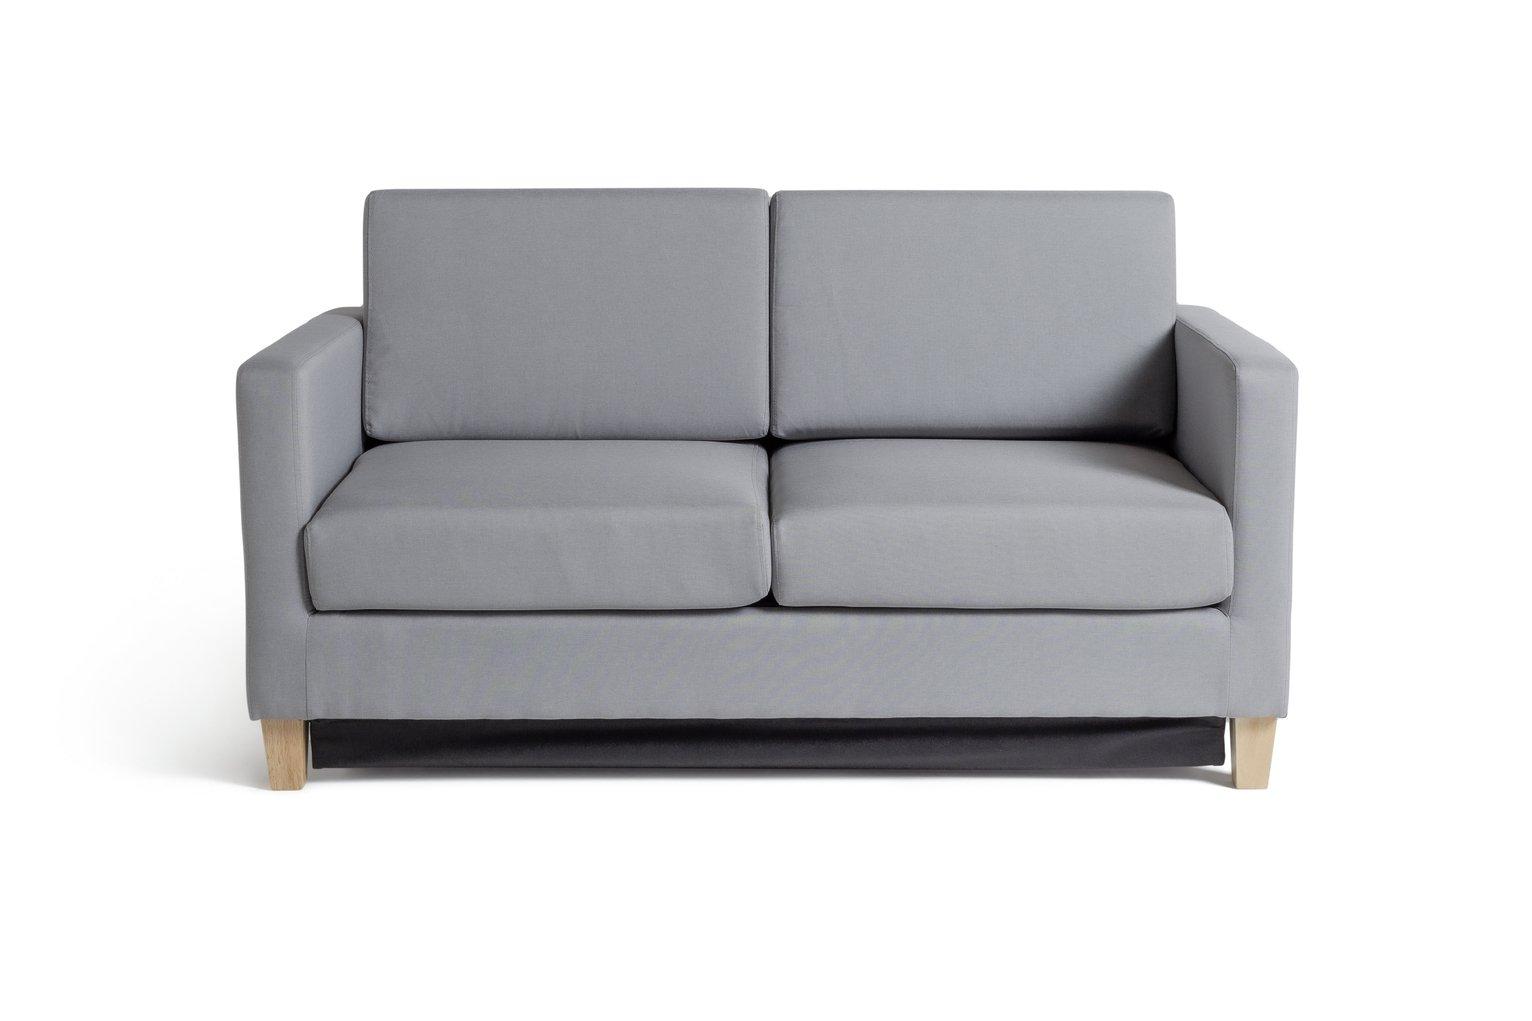 Argos Home Rosie 2 Seater Fabric Sofa Bed - Light Grey